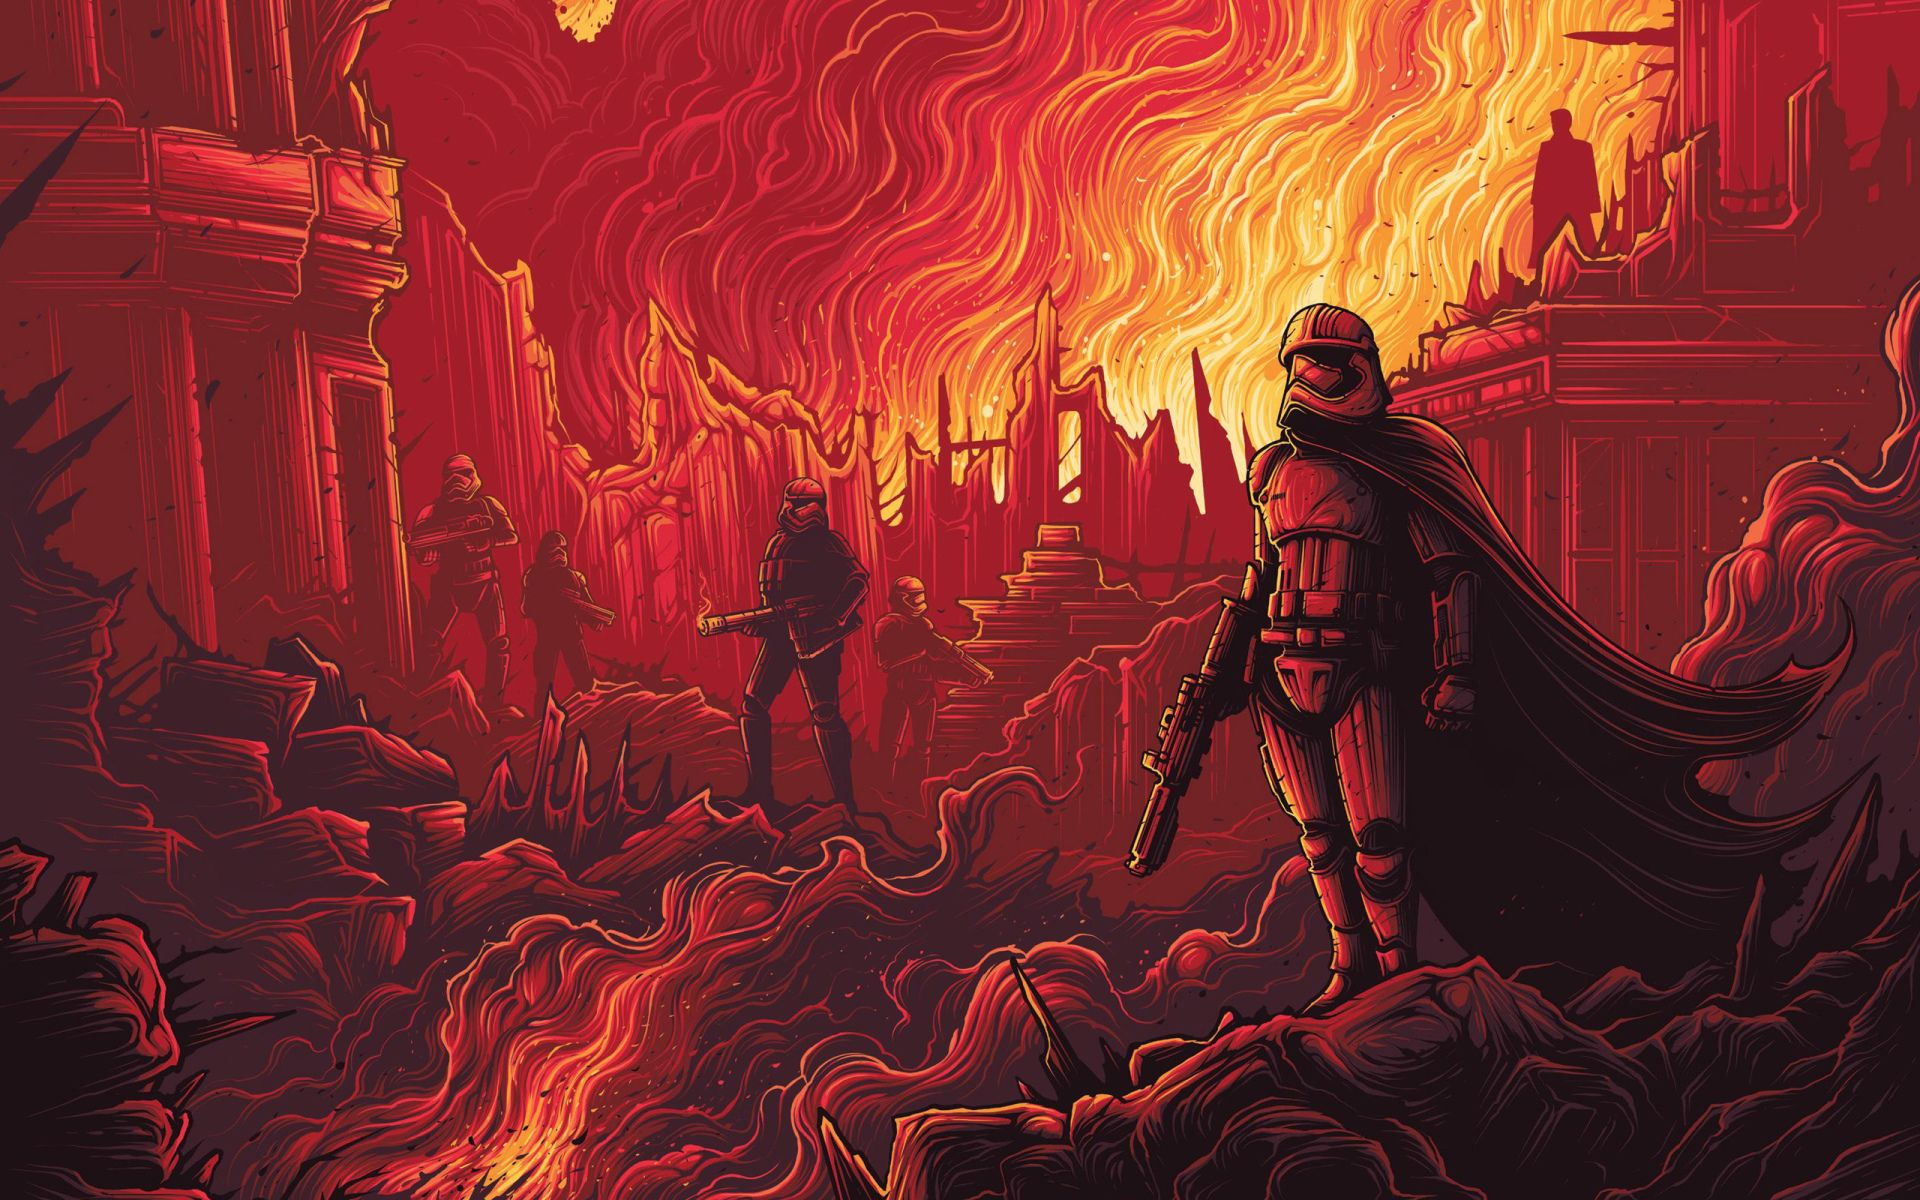 Star Wars Episode Vii The Force Awakens Wallpaper 093 Star Wars Wallpaper Force Awakens Poster Star Wars Episode Vii